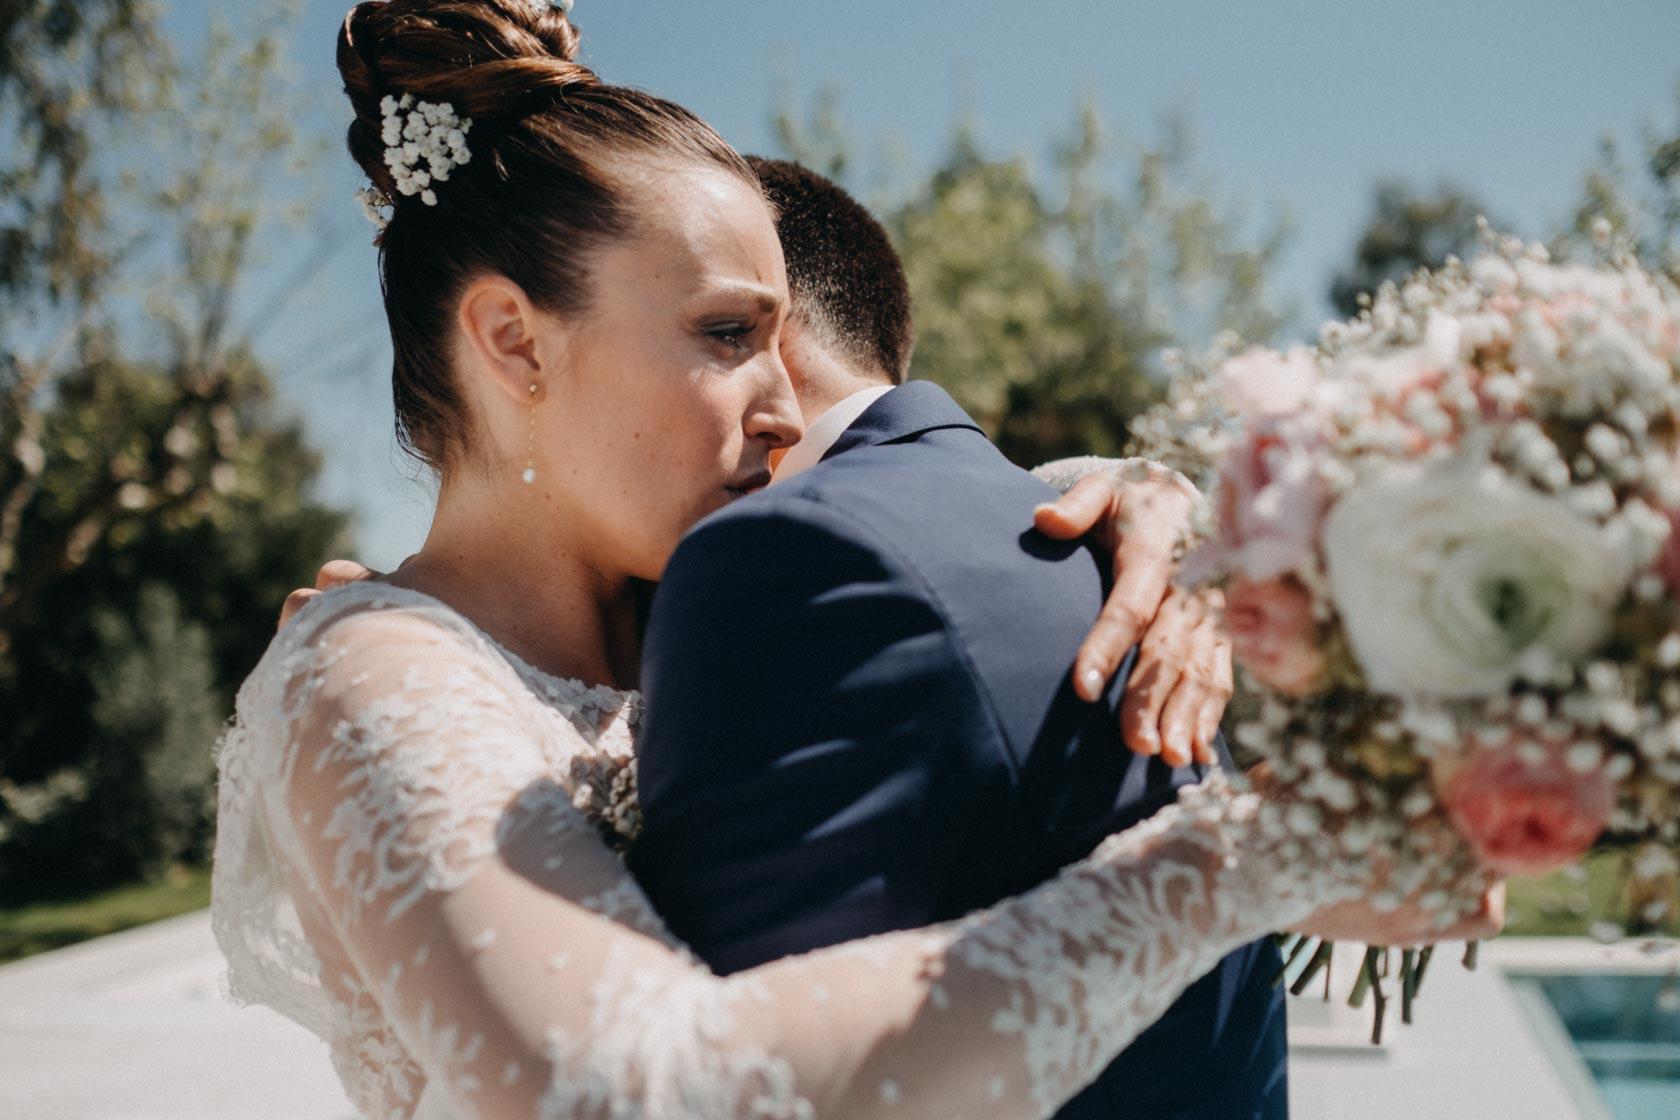 photographe-mariage-chateau-autignac-beziers-studio-lm-3297.jpg